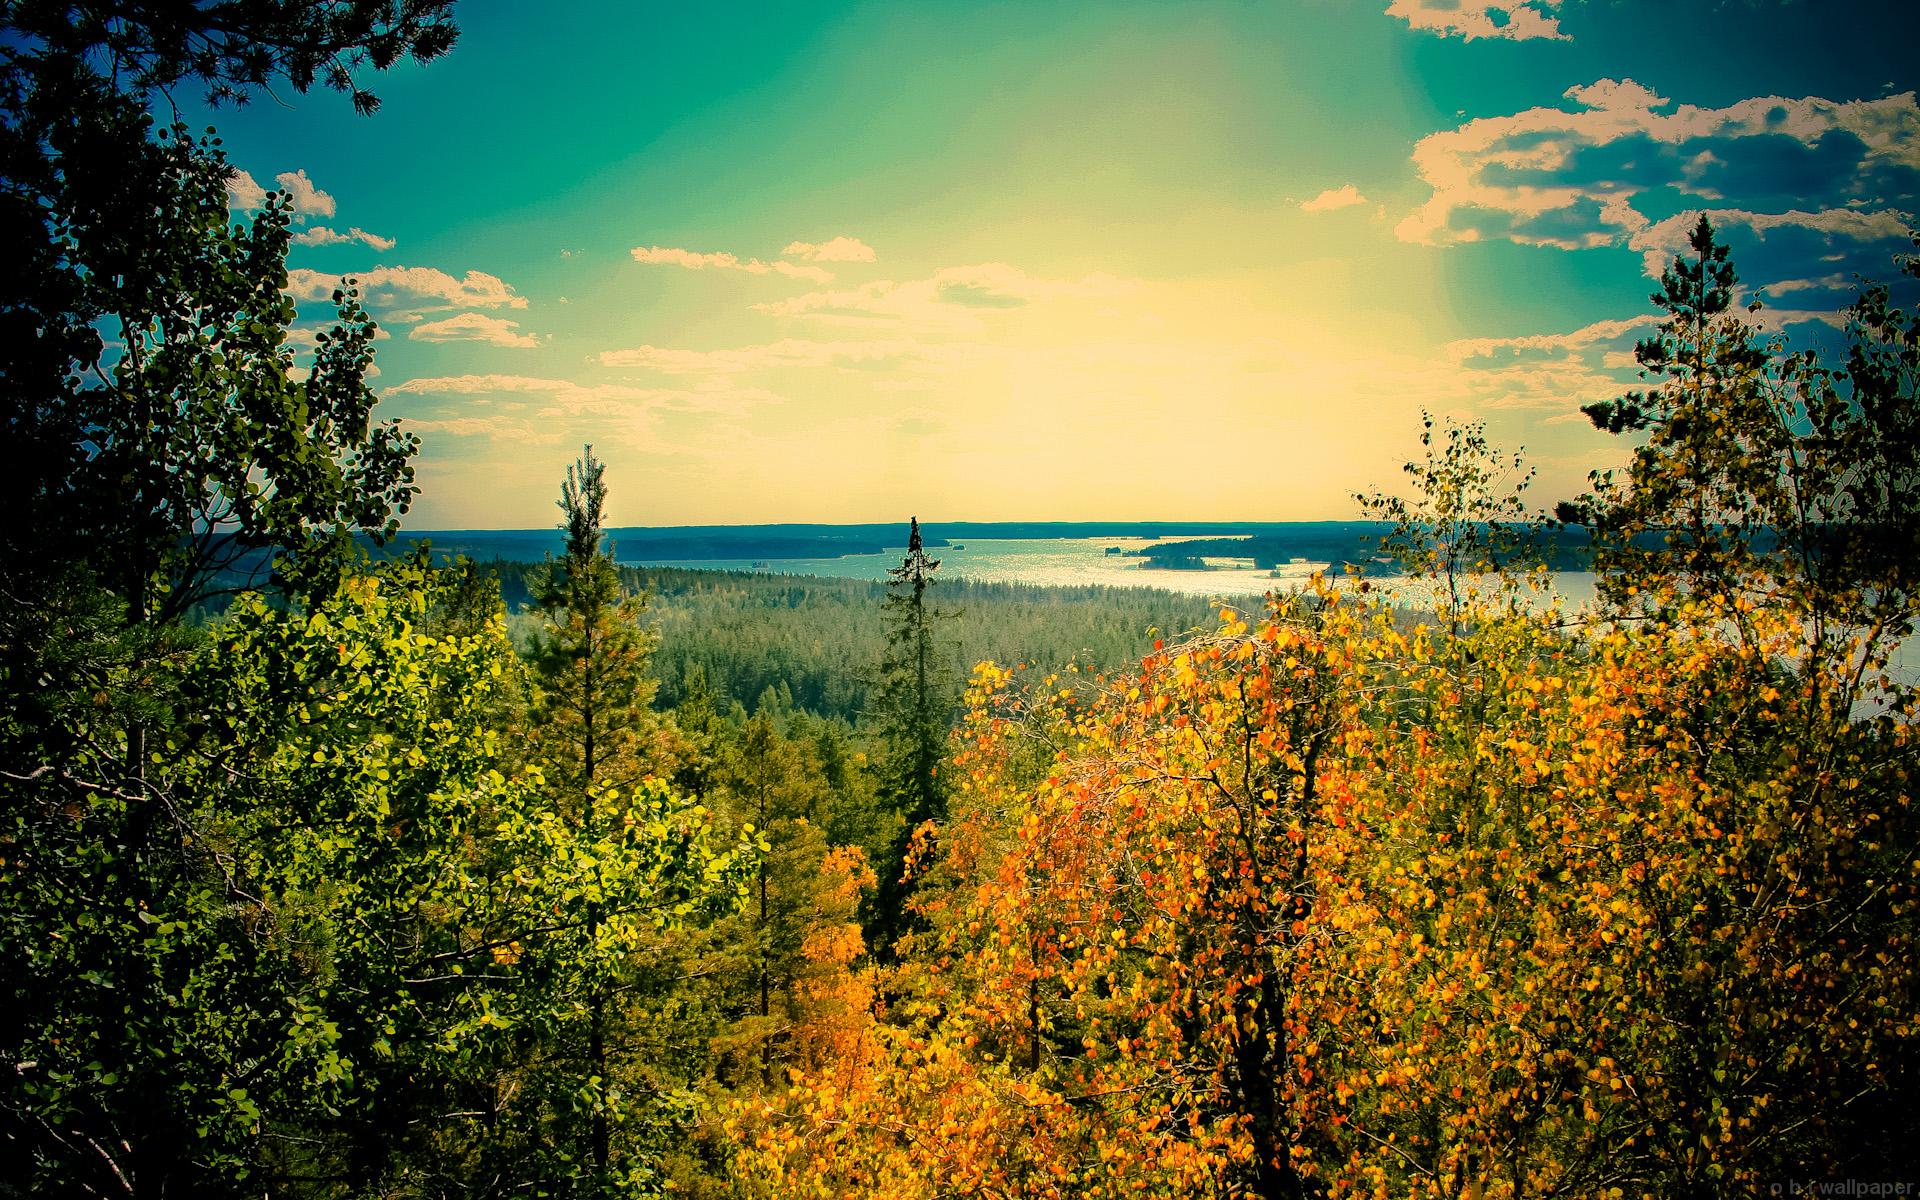 finlandia wallpaper obis wallpaper 1920x1200